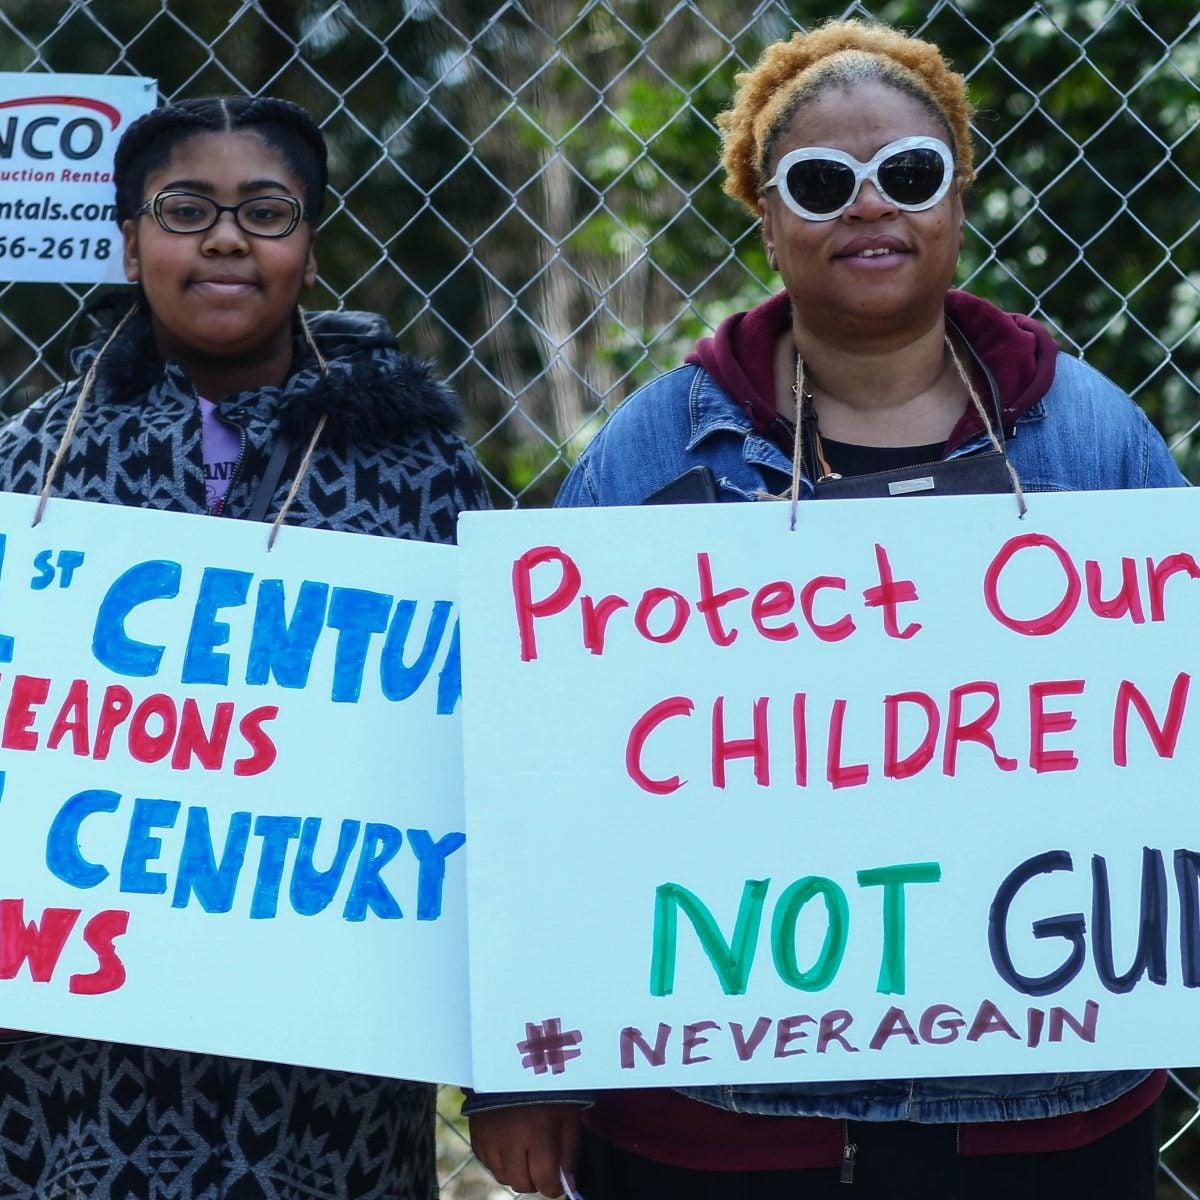 President Biden Says Gun Reform is Necessary, Retired Chief Deputy Says Not So Fast